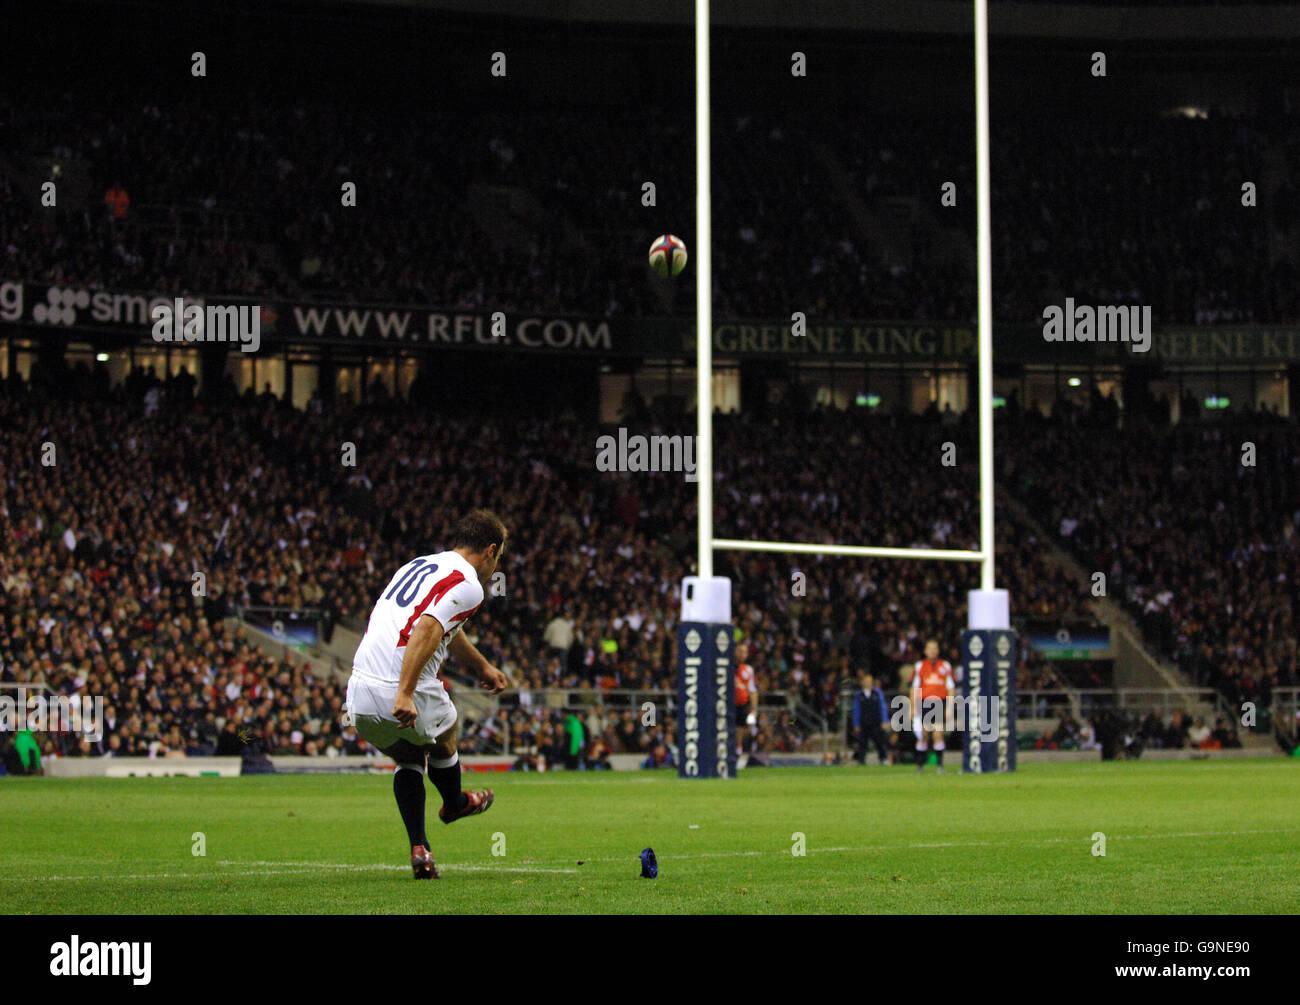 Rugby Union - Investec Challenge Autumn Series 2006 - England v New Zealand - Twickenham Stock Photo